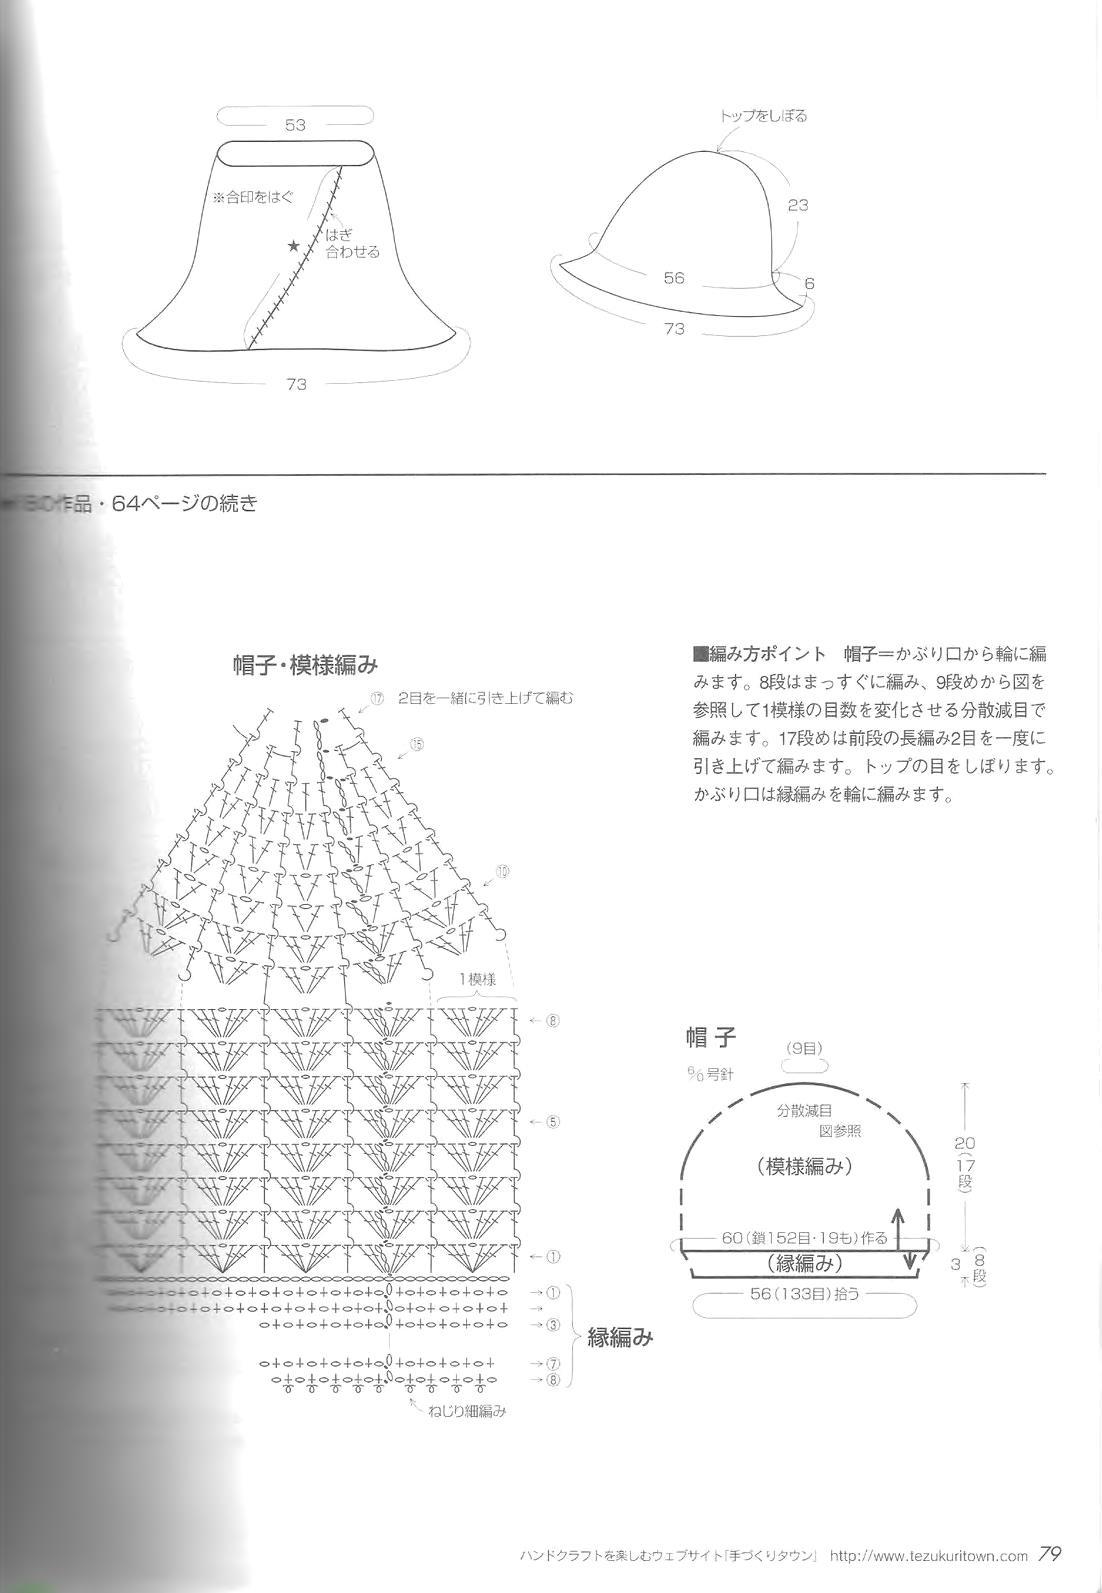 Let's knit series NV4375 2008 M-L sp-kr_79